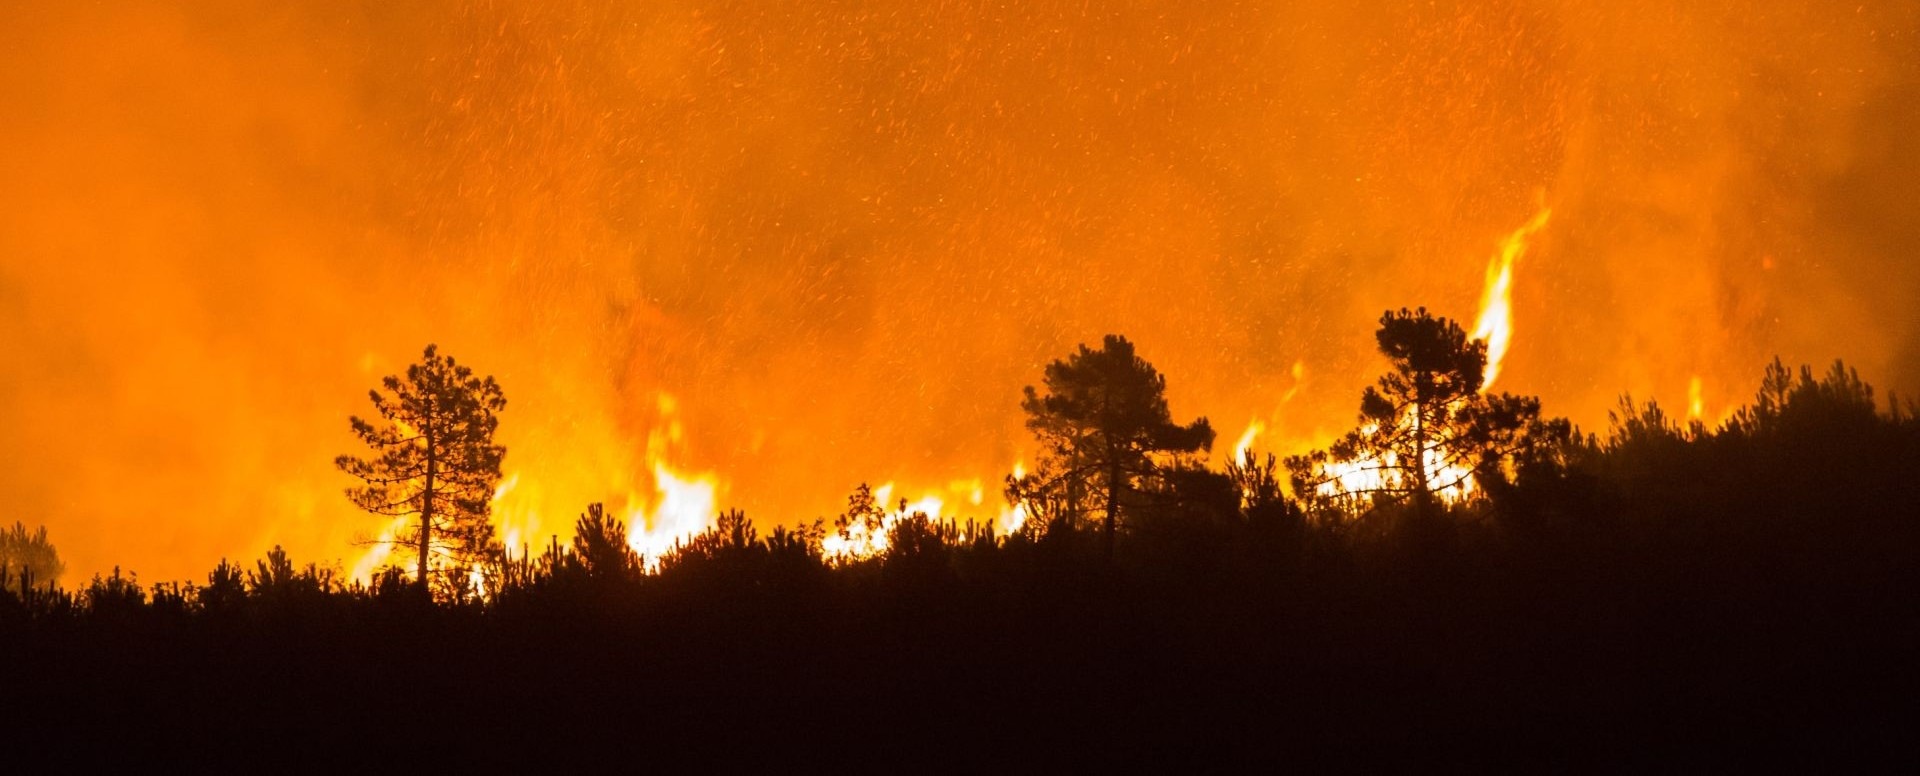 VIDEO: Preko vikenda u sjevernoj Španjolskoj gorjelo oko 130 divljih požara